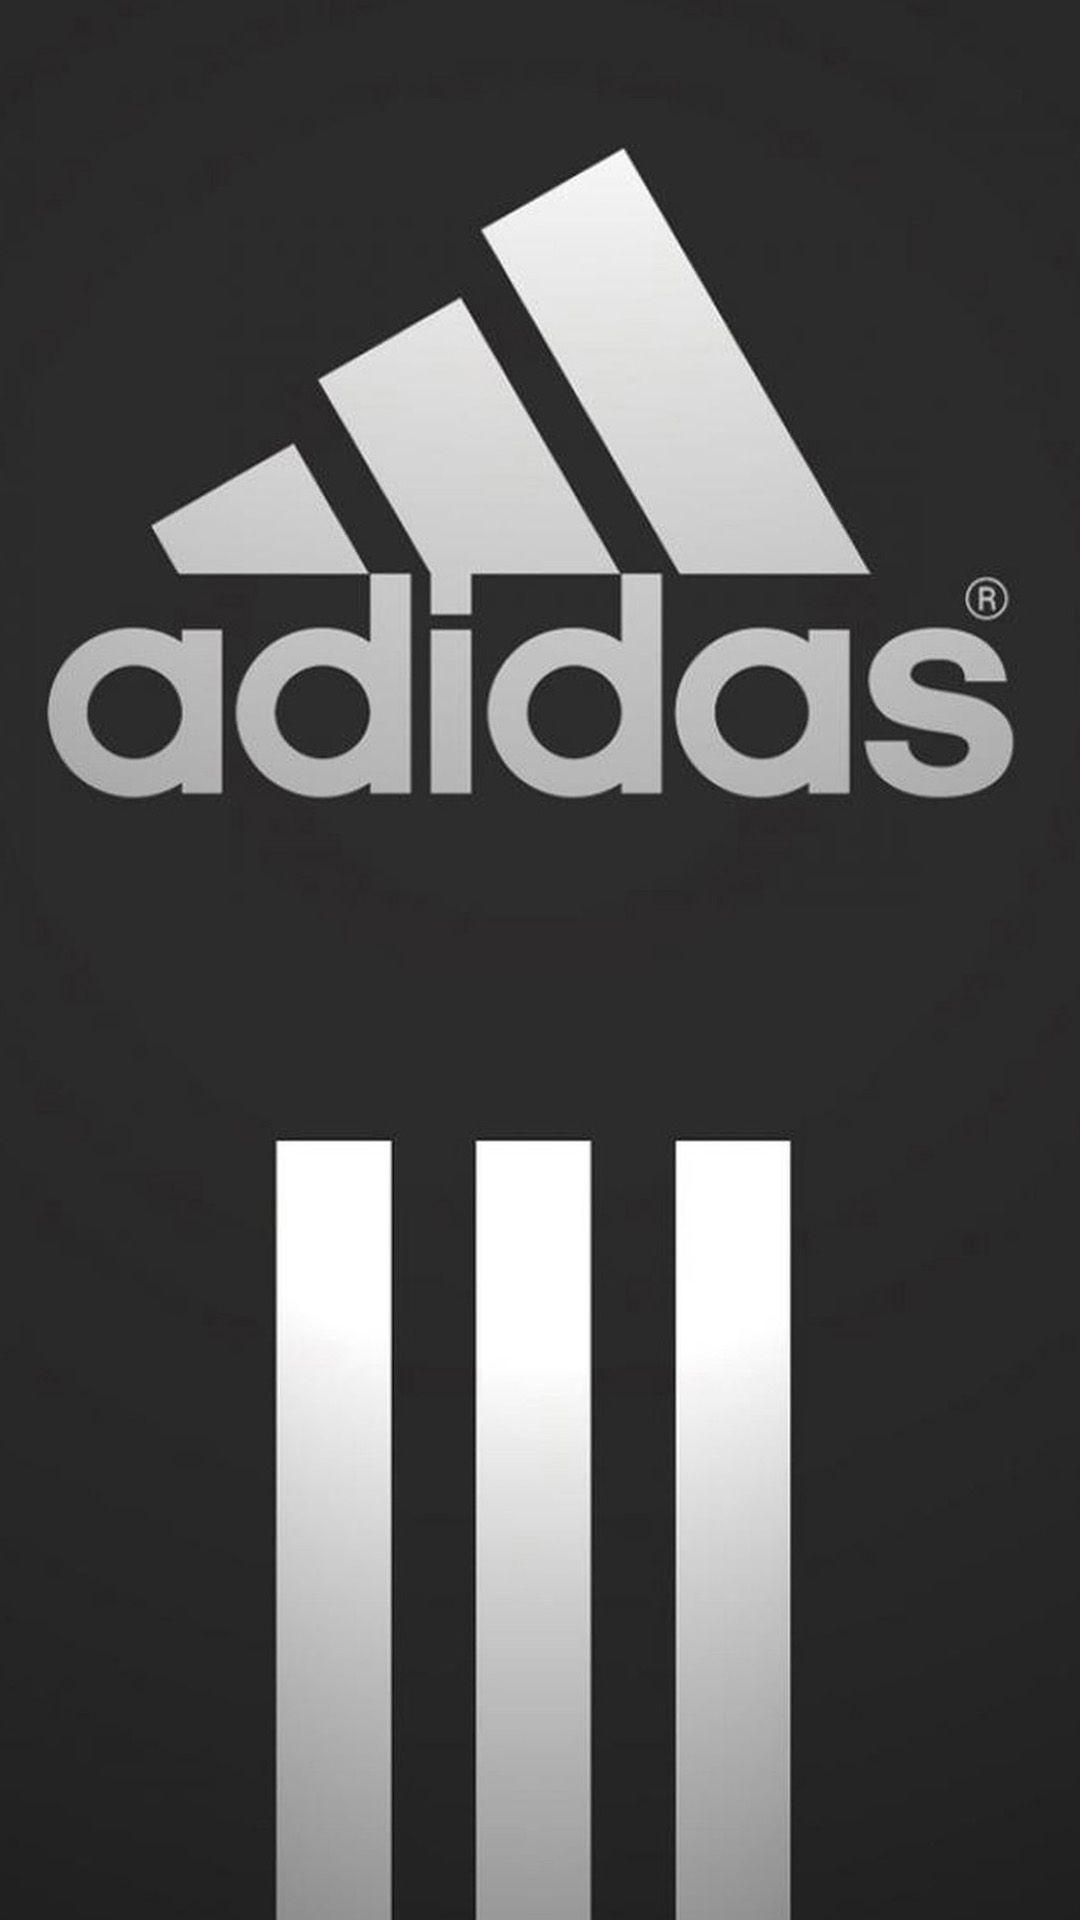 Adidas Stripes Htc e M8 wallpaper Advertising